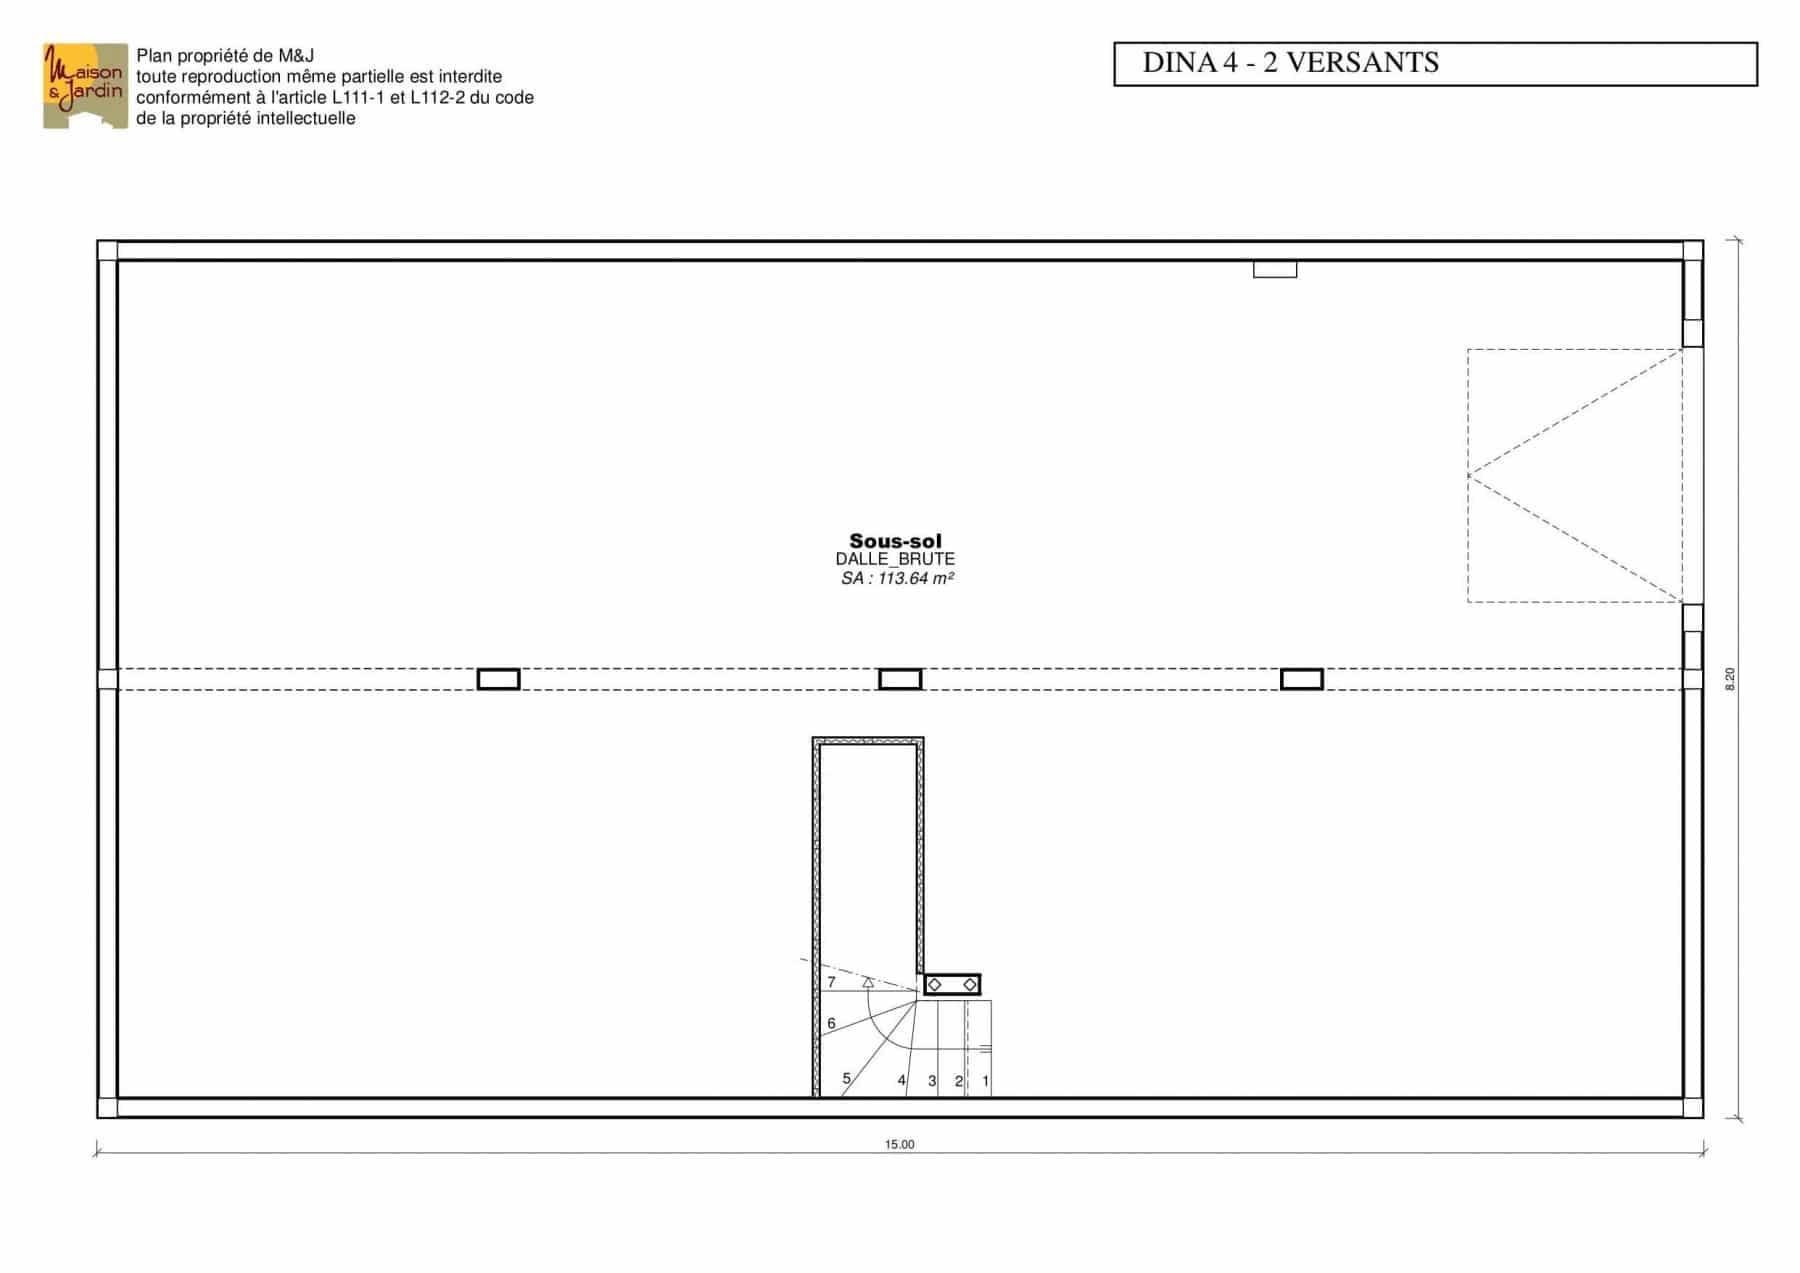 plan maison Dina101(2v)ssol sans cote